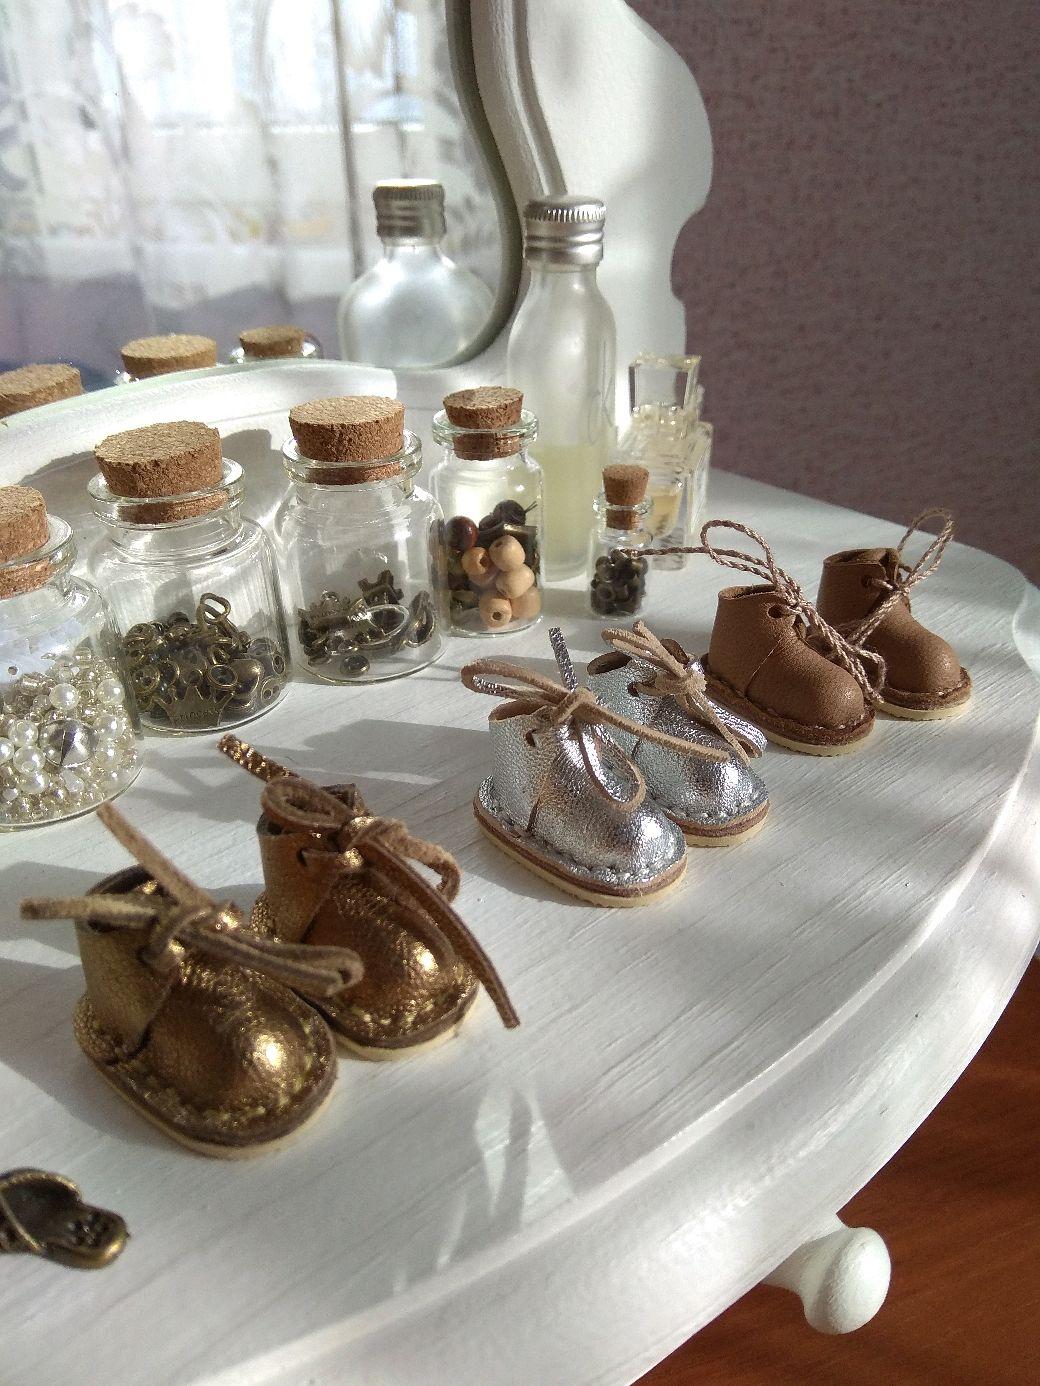 Обувь для блайз, Одежда для кукол, Краснодар, Фото №1